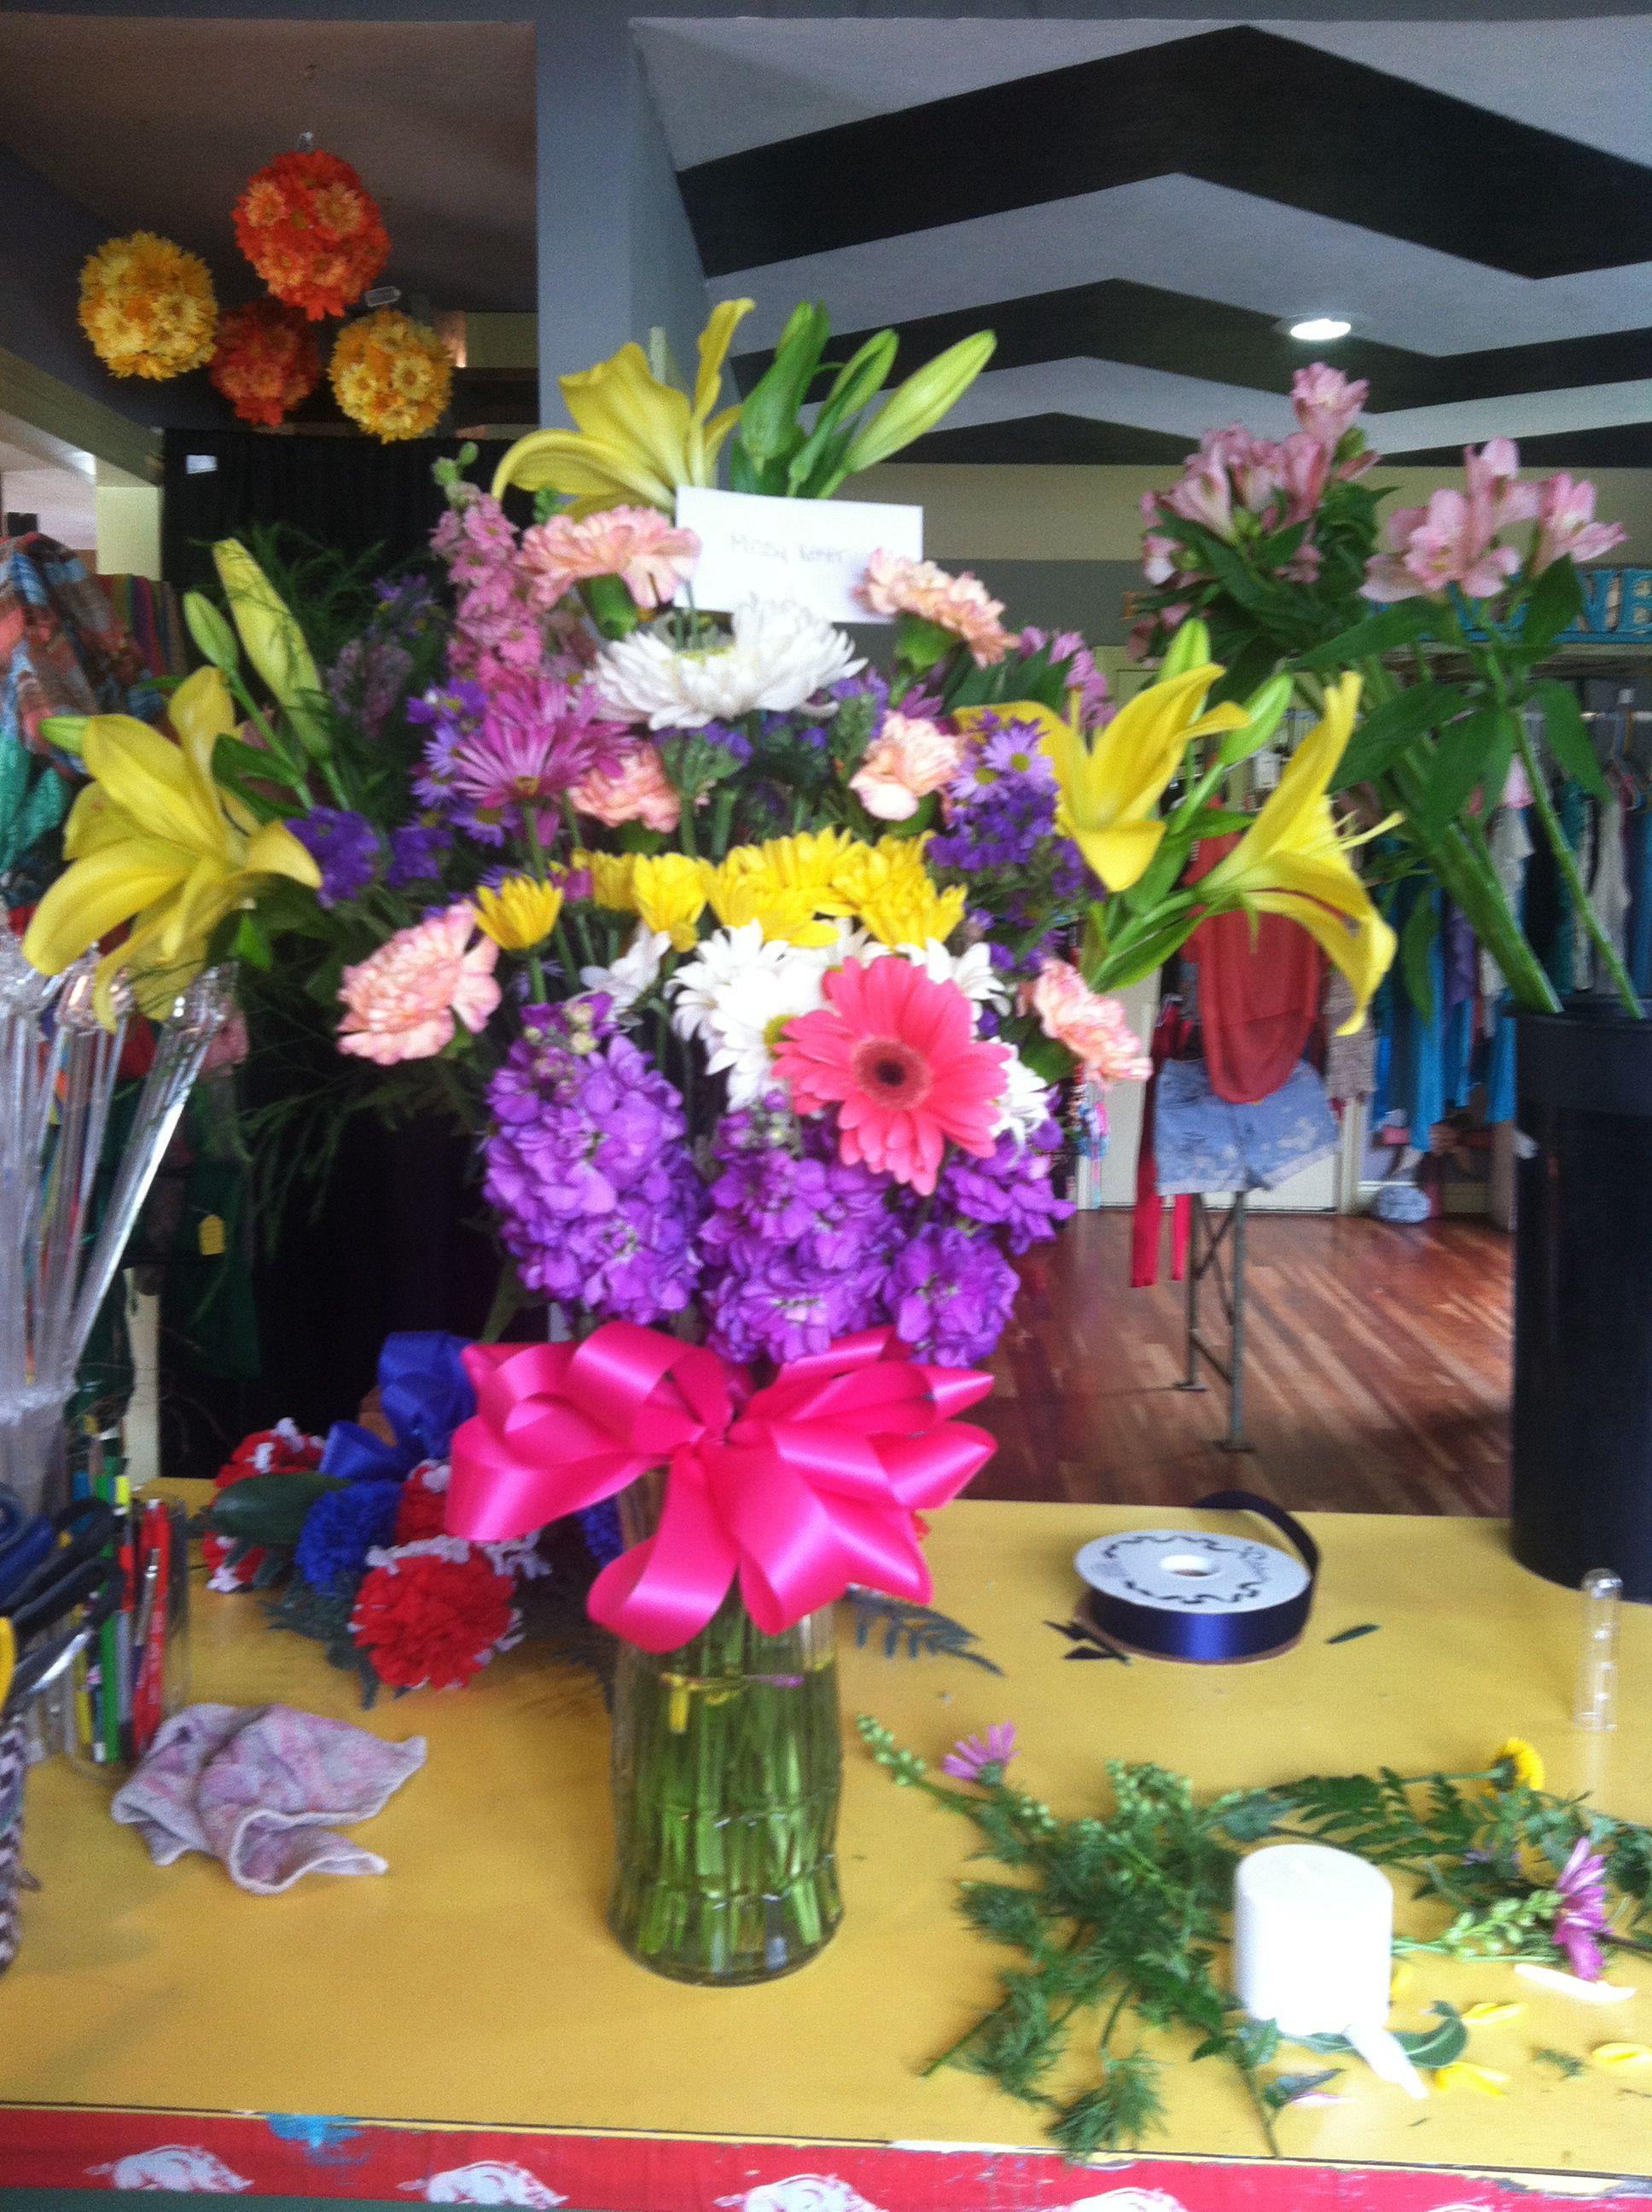 Spring mix flower arrangement i made at work flower arrangements spring mix flower arrangement i made at work mightylinksfo